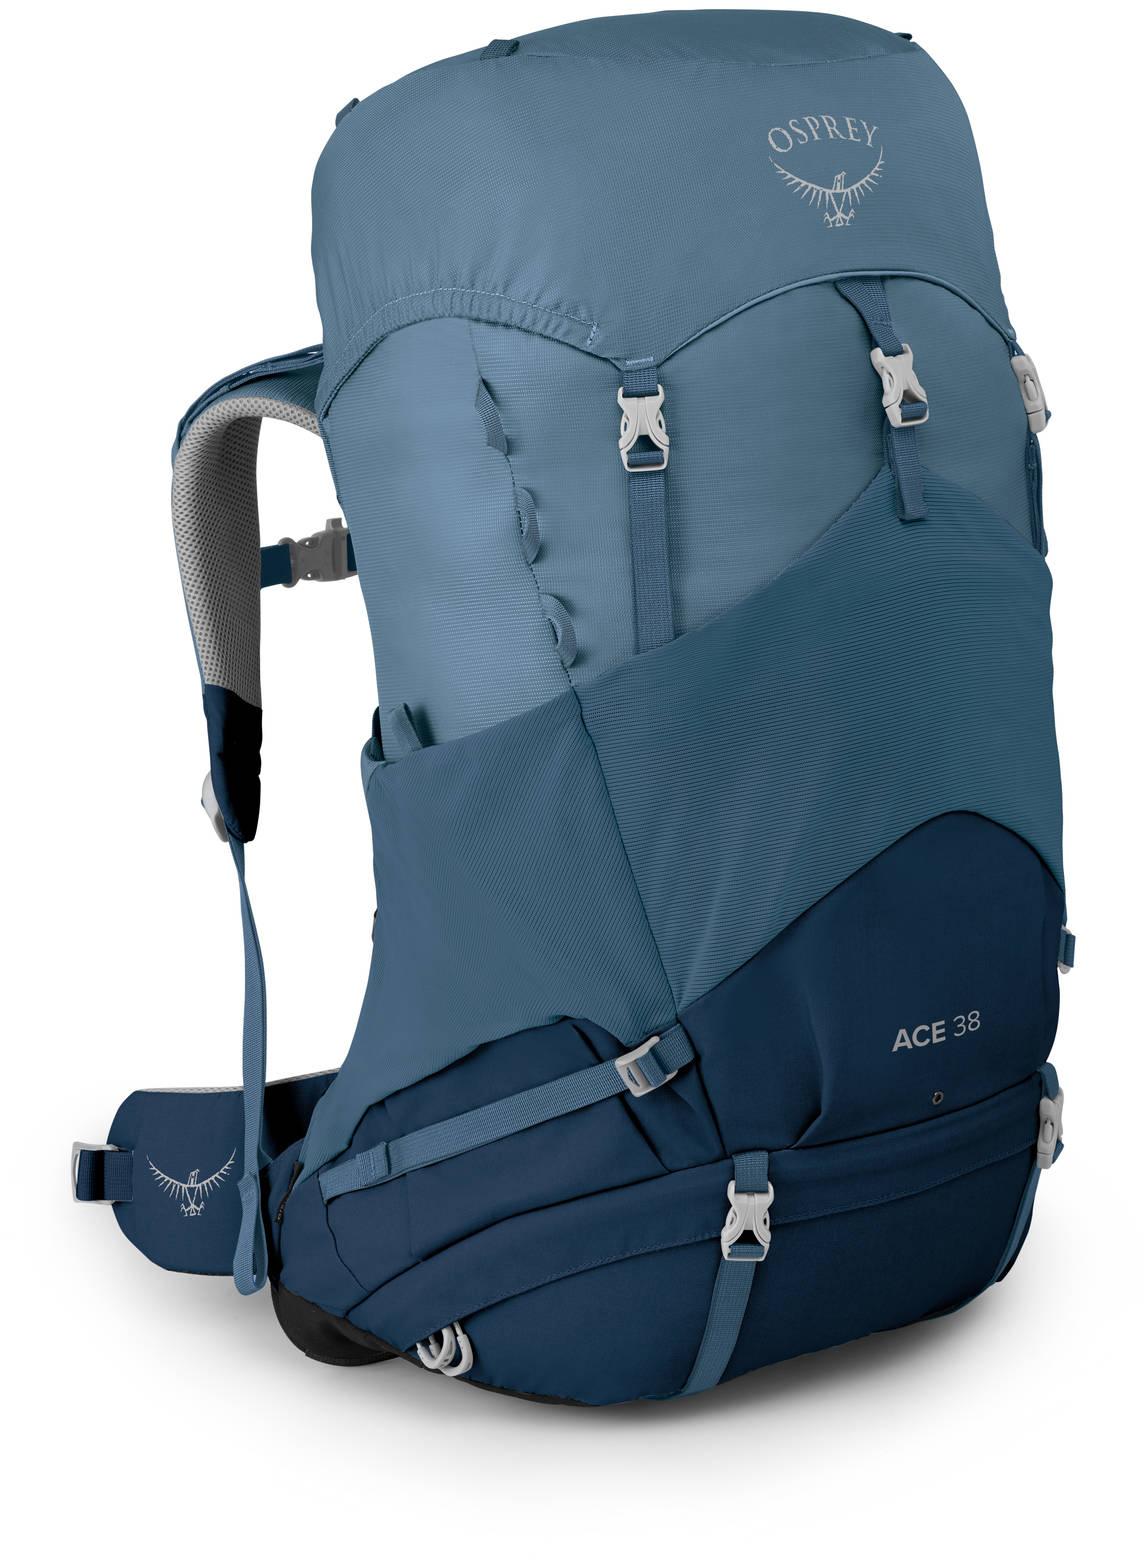 Ace Рюкзак Osprey Ace 38 Blue Hills Ace_38_S20_Side_Blue_Hills_web.jpg